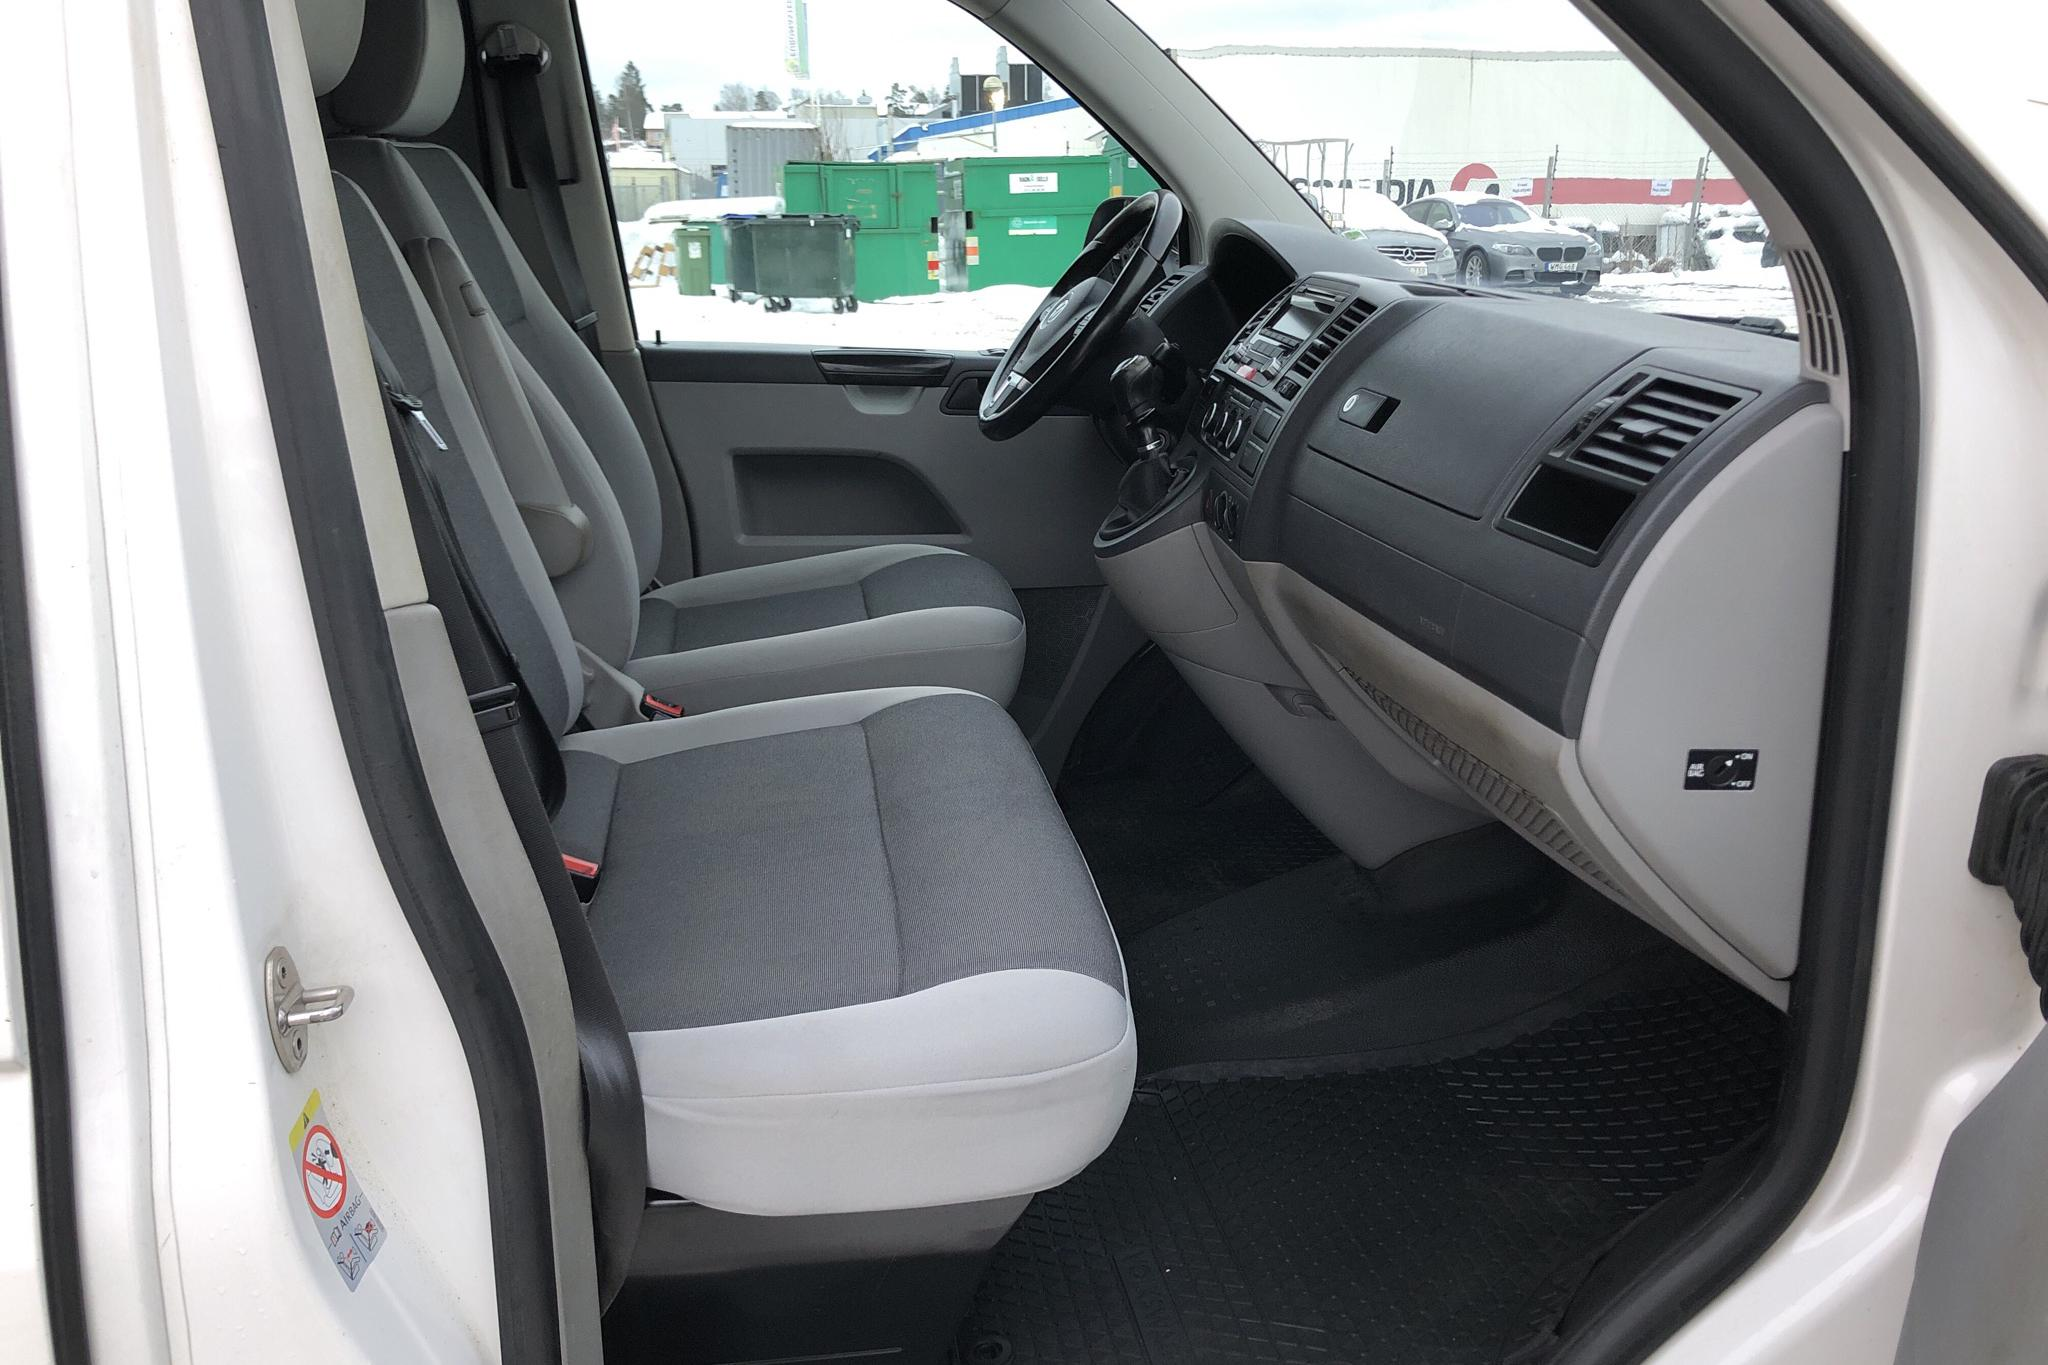 VW Transporter T5 2.0 TDI 4MOTION (140hk) - 93 200 km - Manual - white - 2014